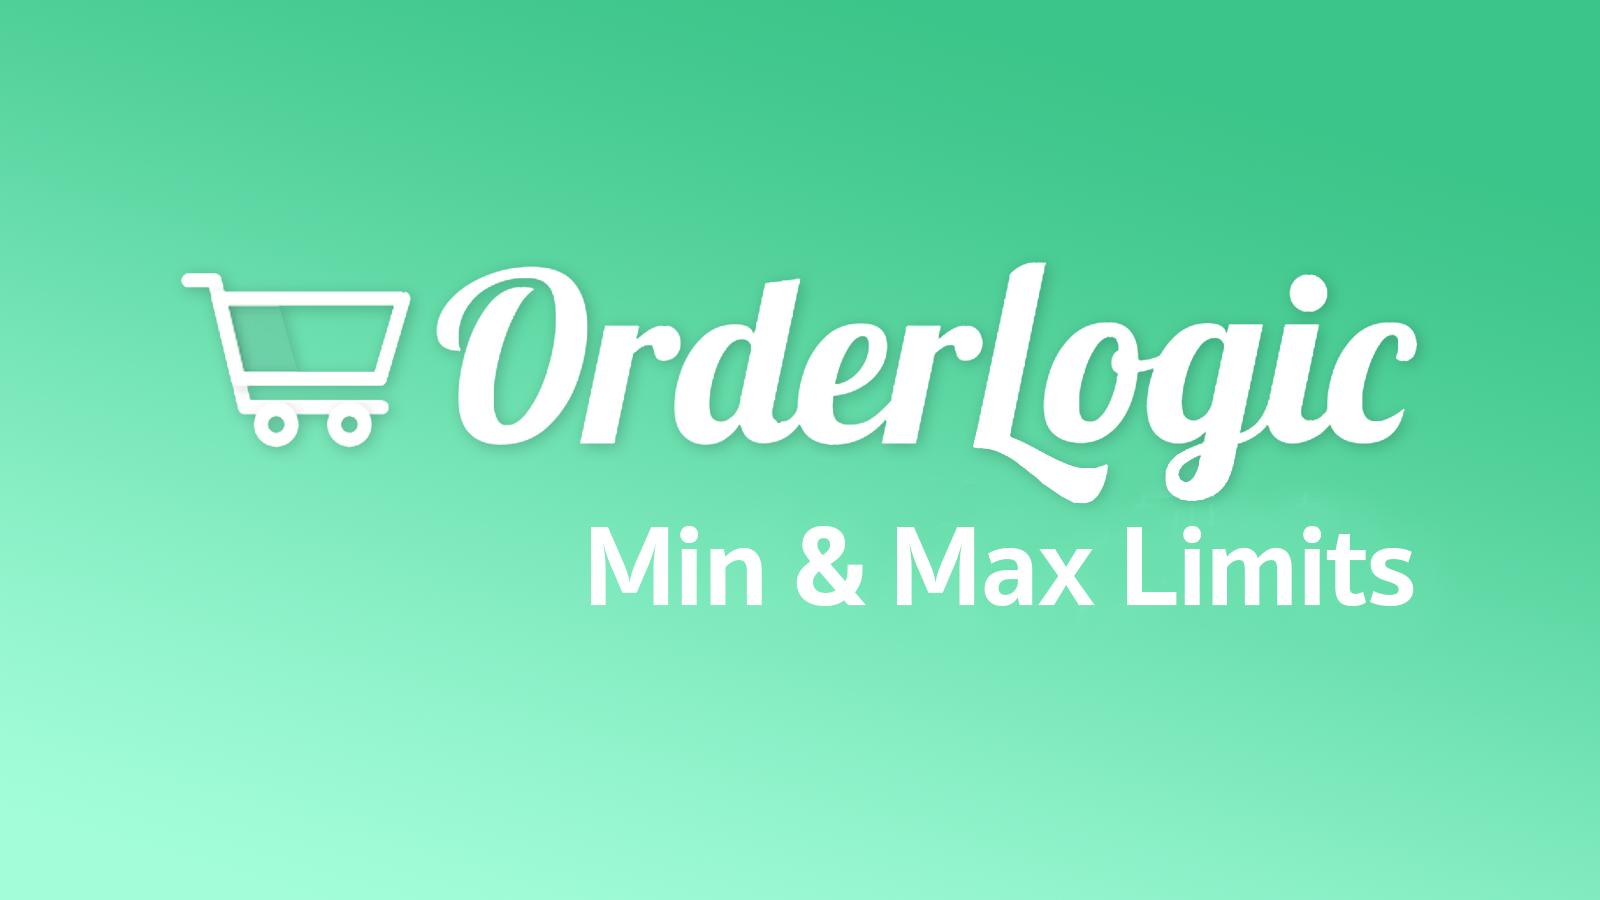 Orderlogic banner